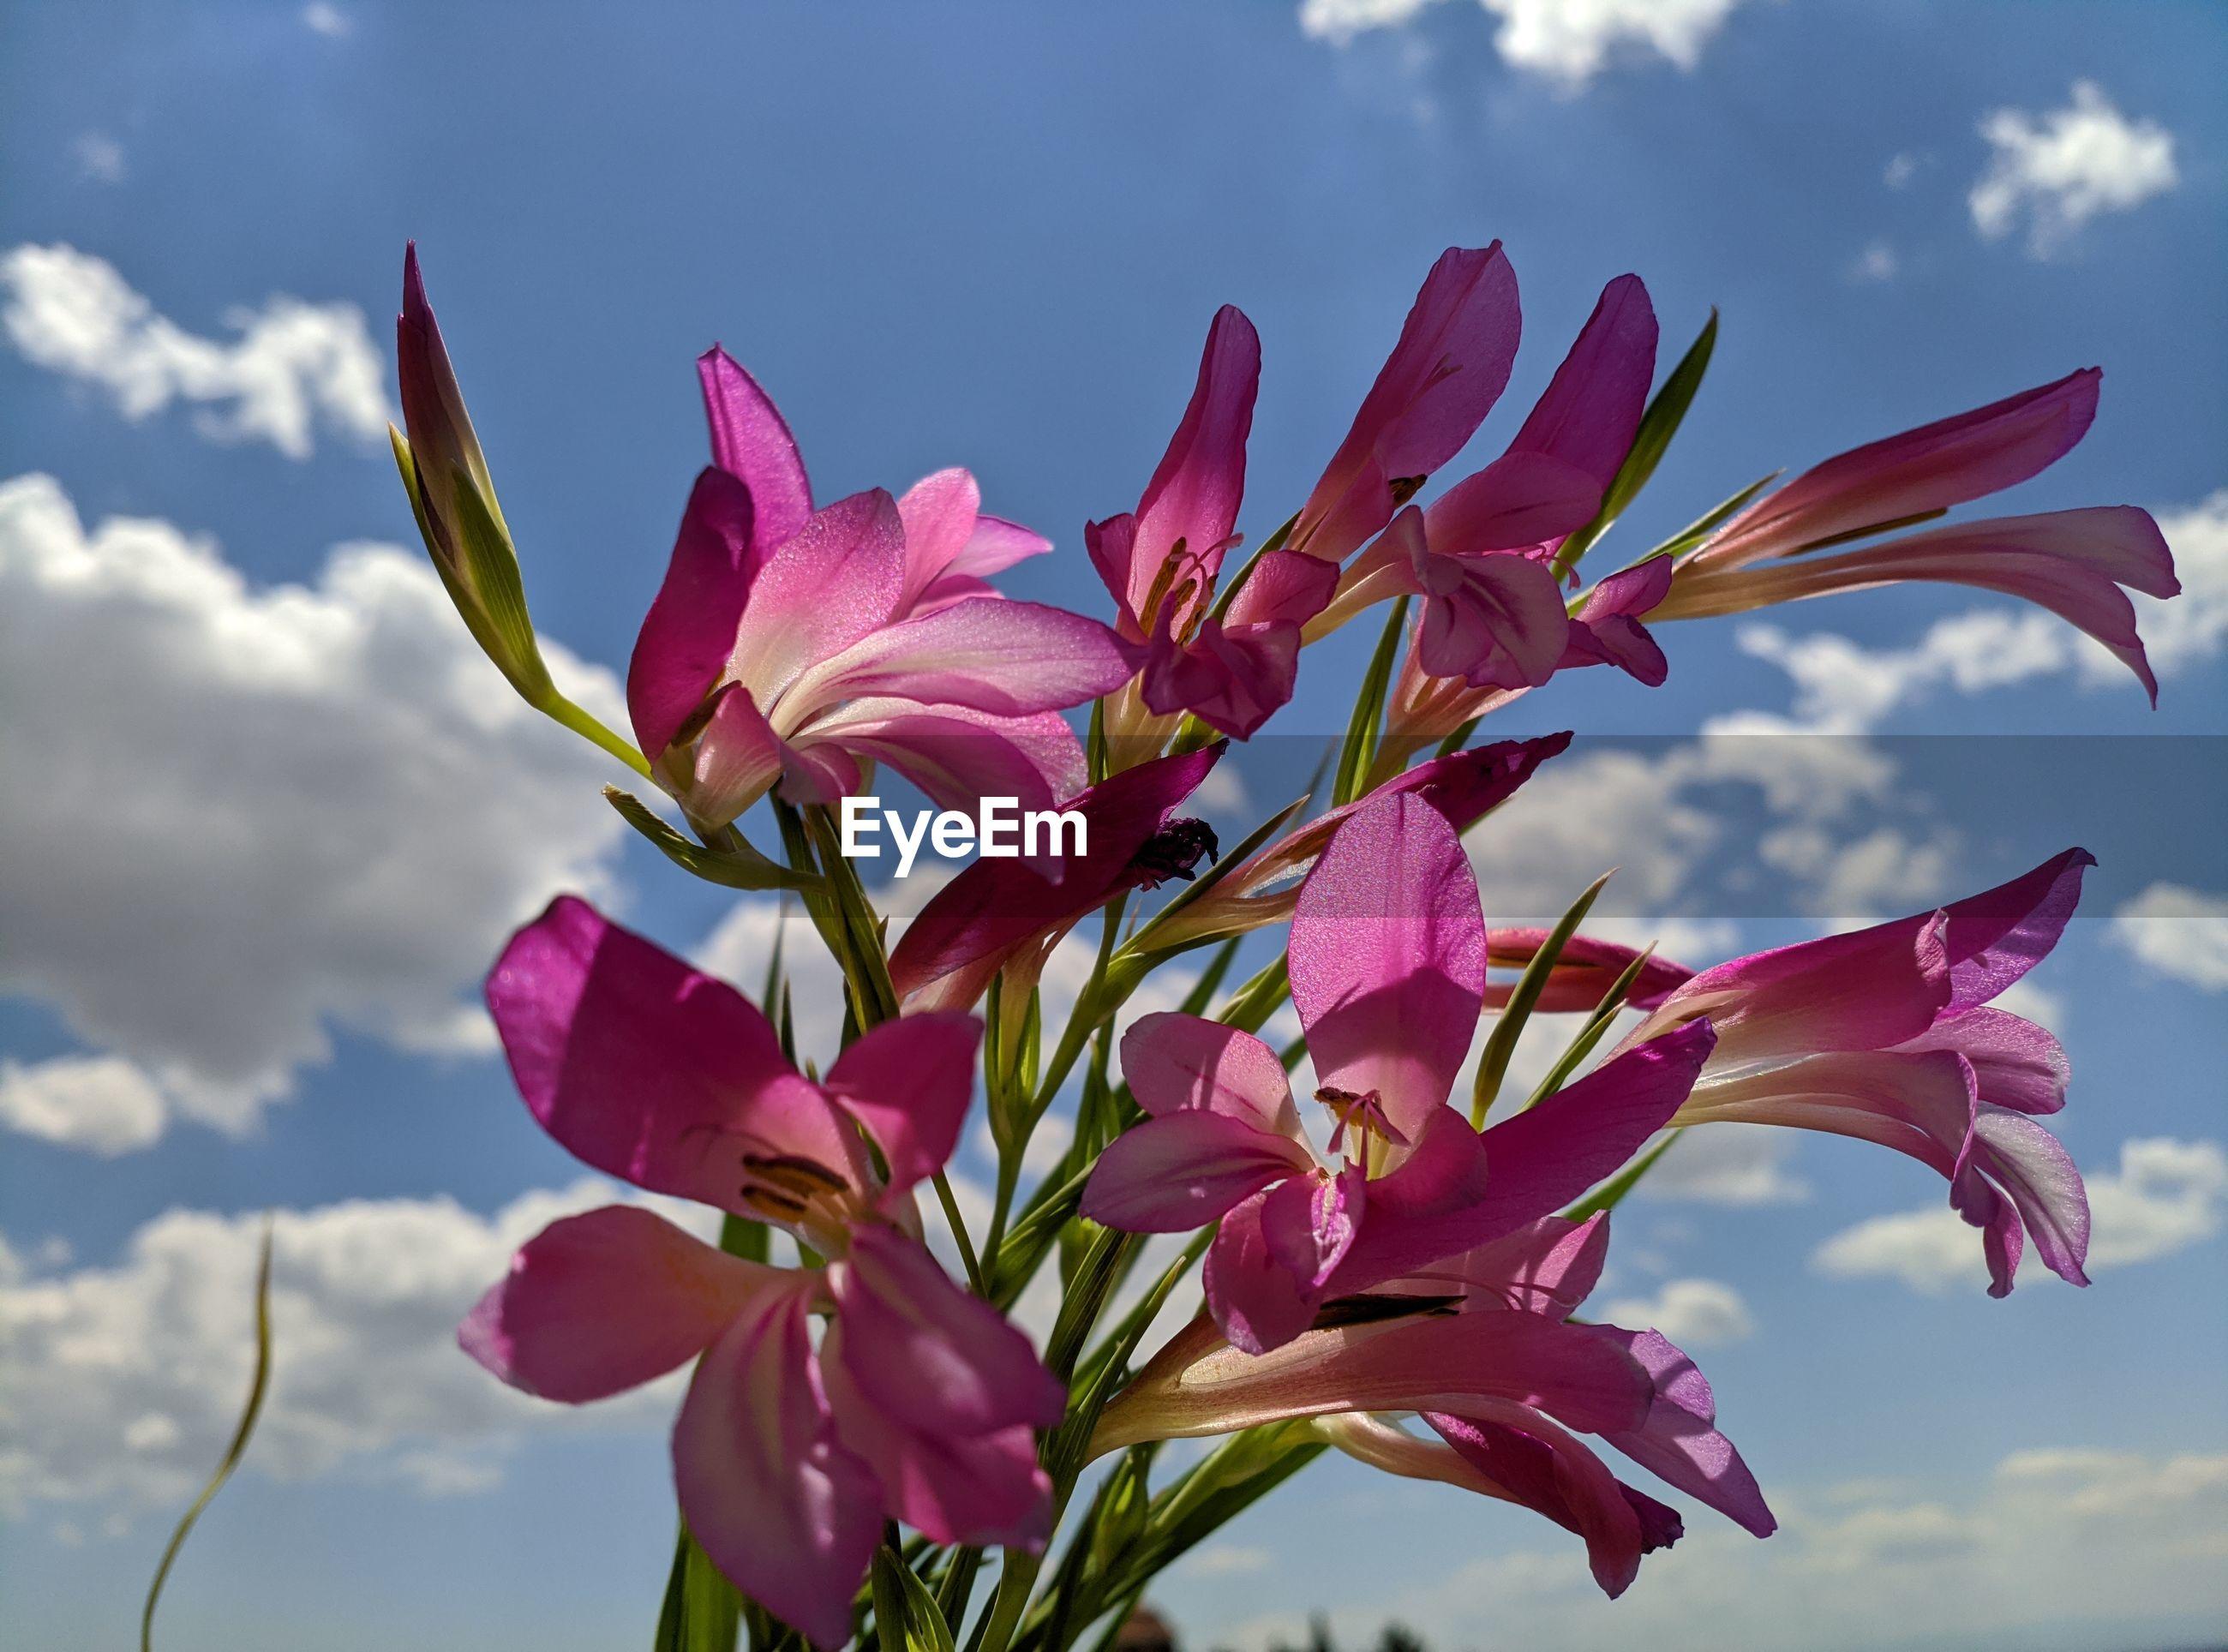 Close-up of pink gladiolus flowering plant against sky